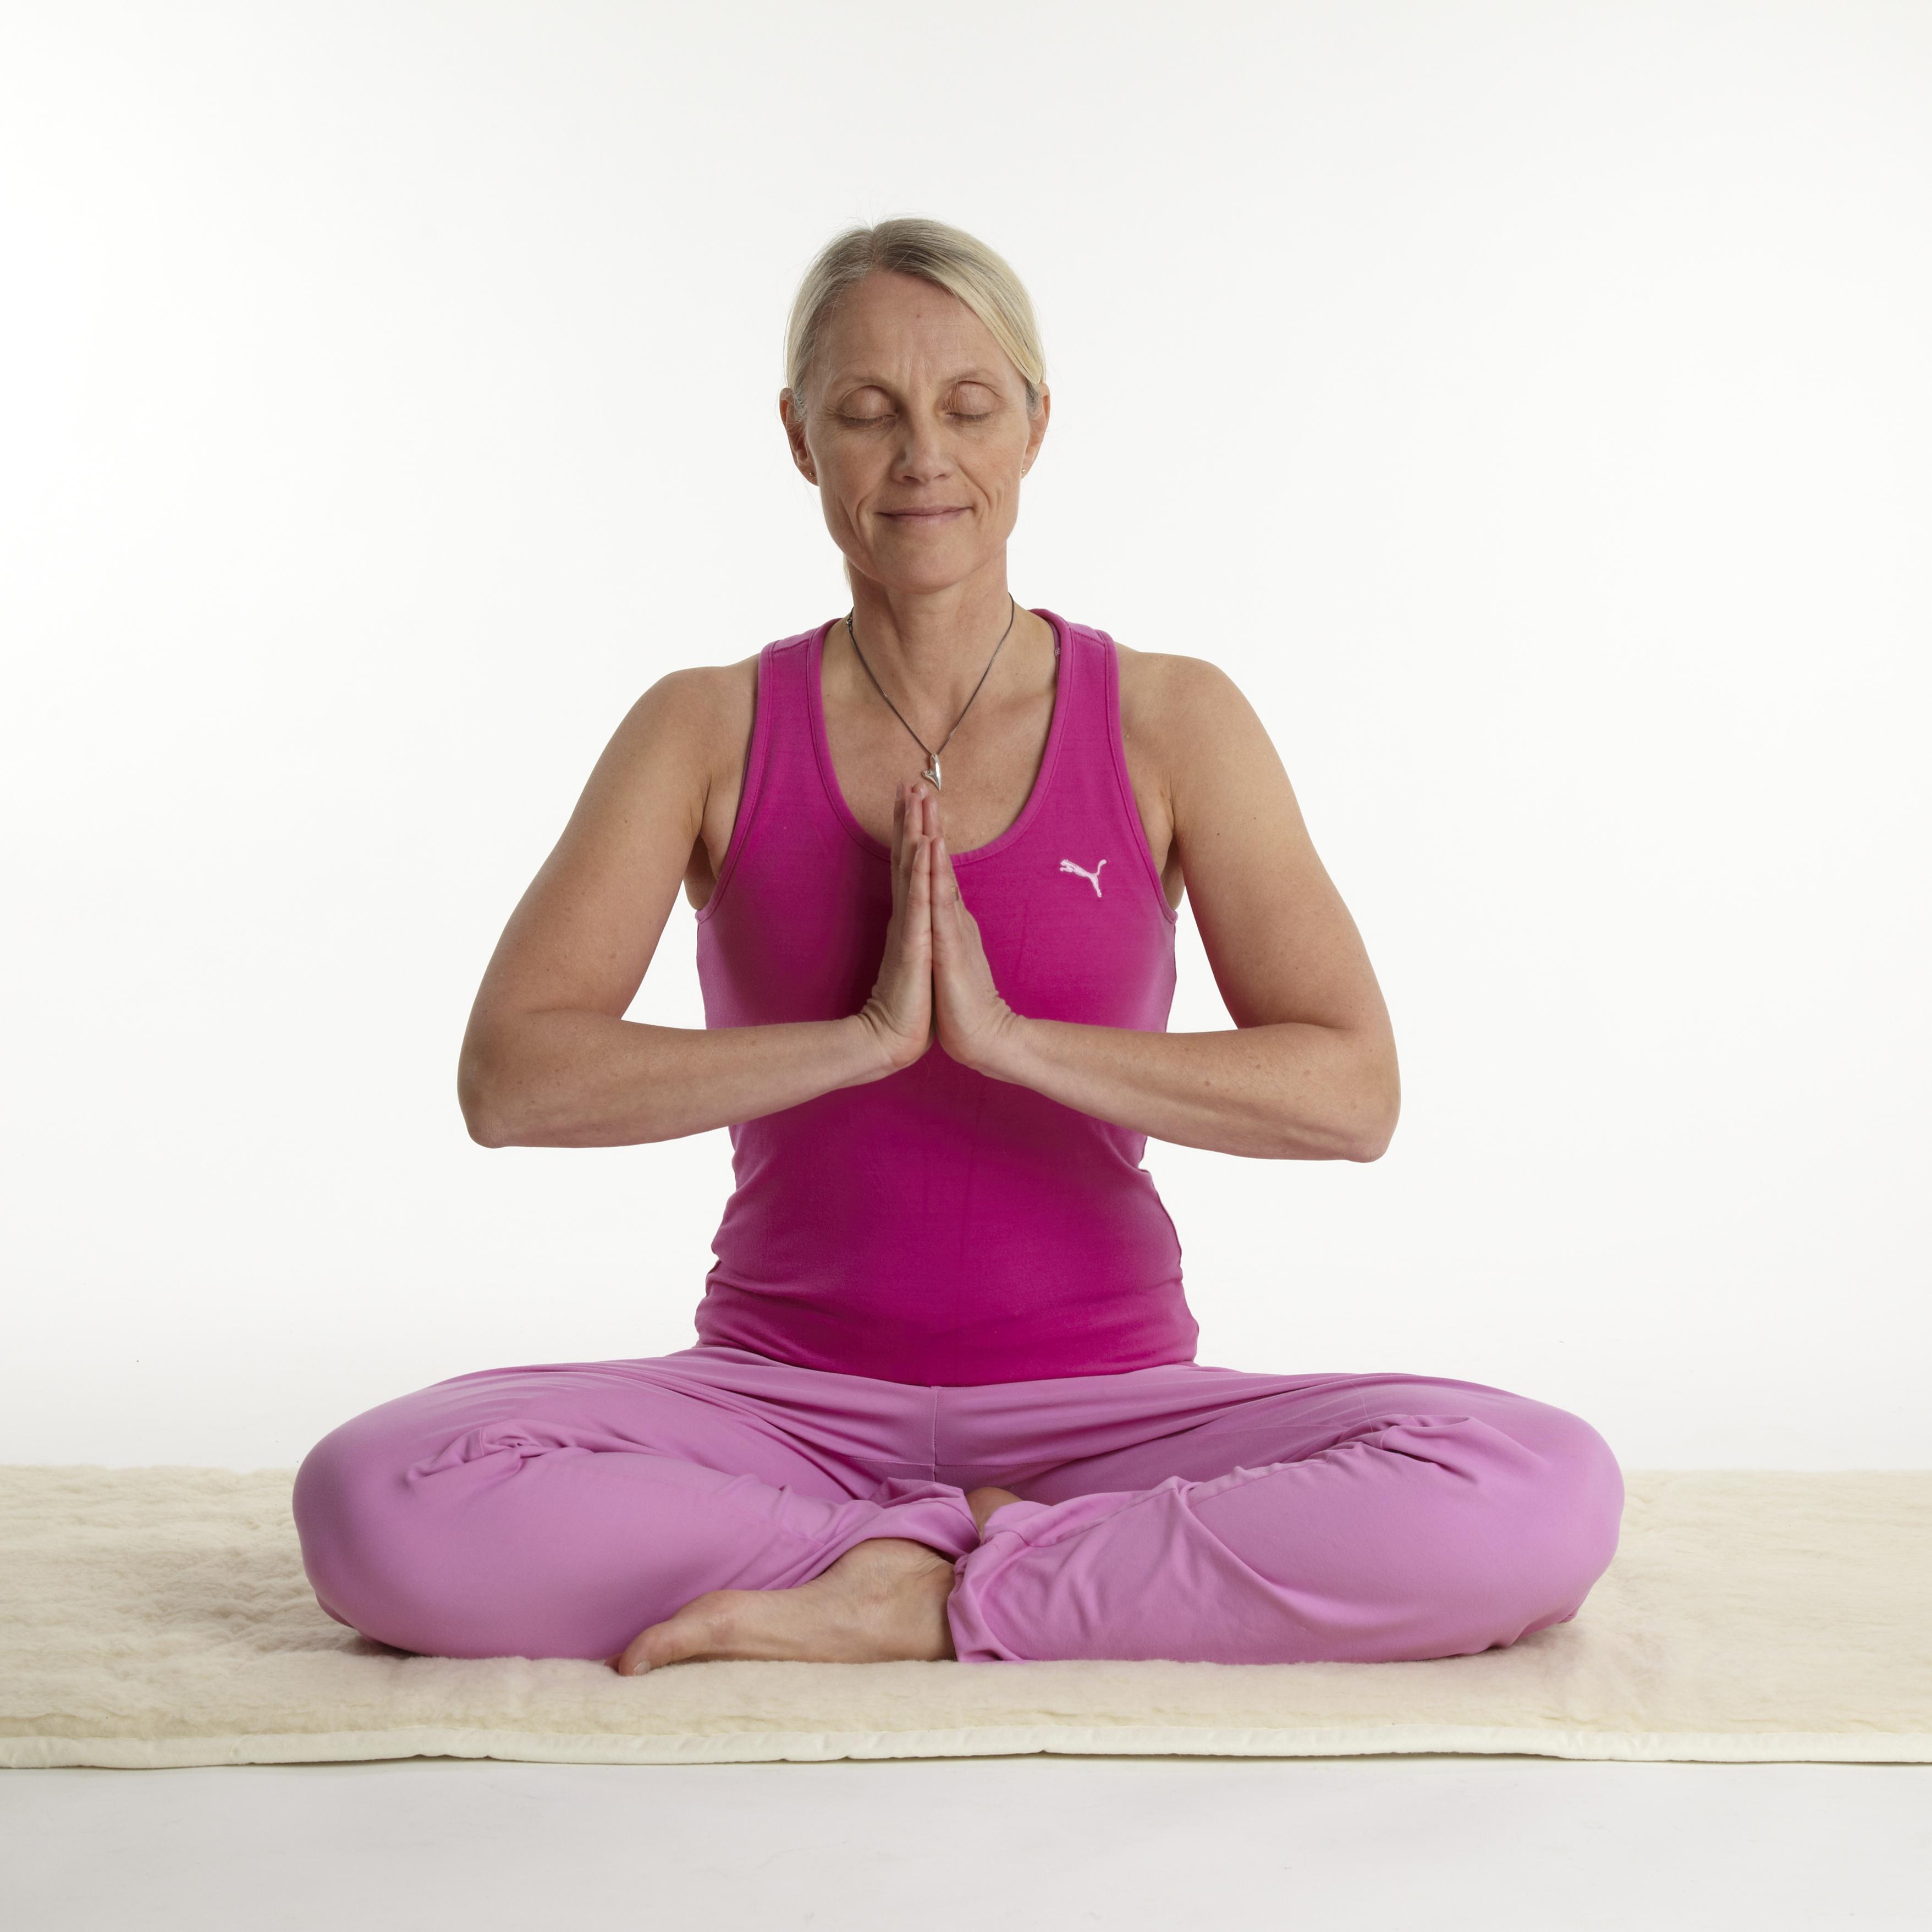 galleri 4 - På Yogakraft hittar du Yoga 8c2301883b625